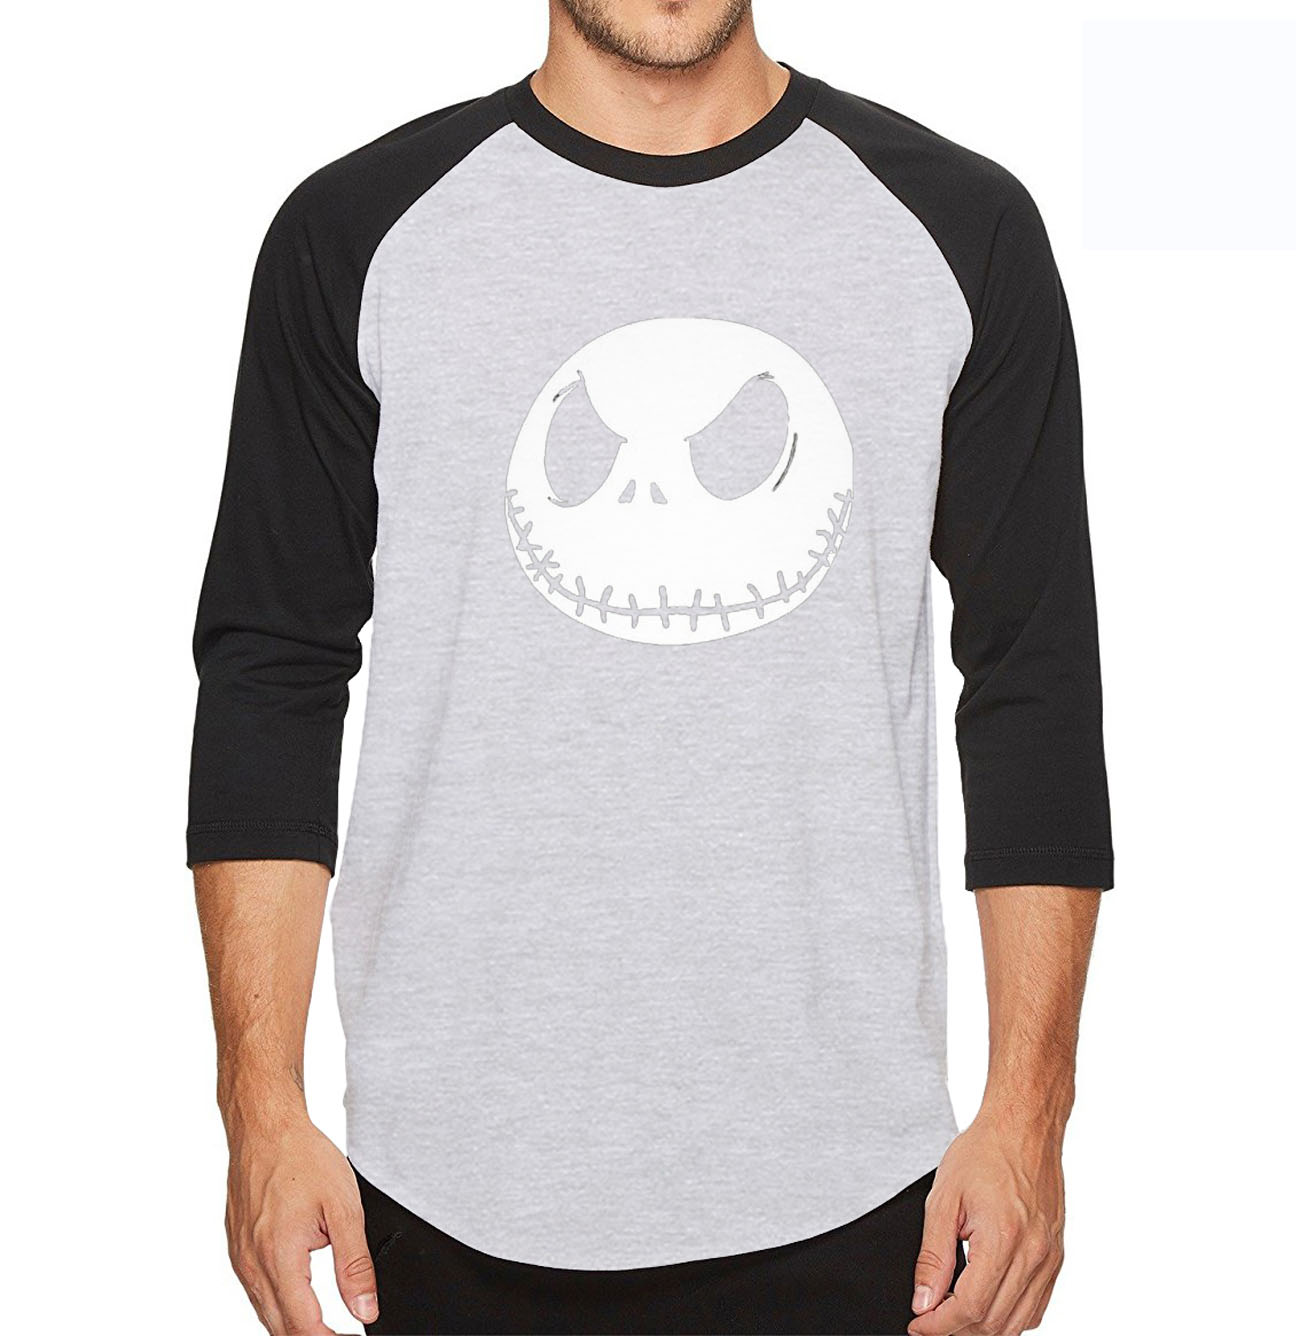 2018 summer men t shirt Nightmare Before Christmas Jack Skellington 3/4 sleeve tshirt cotton high quality raglan tee shirt men